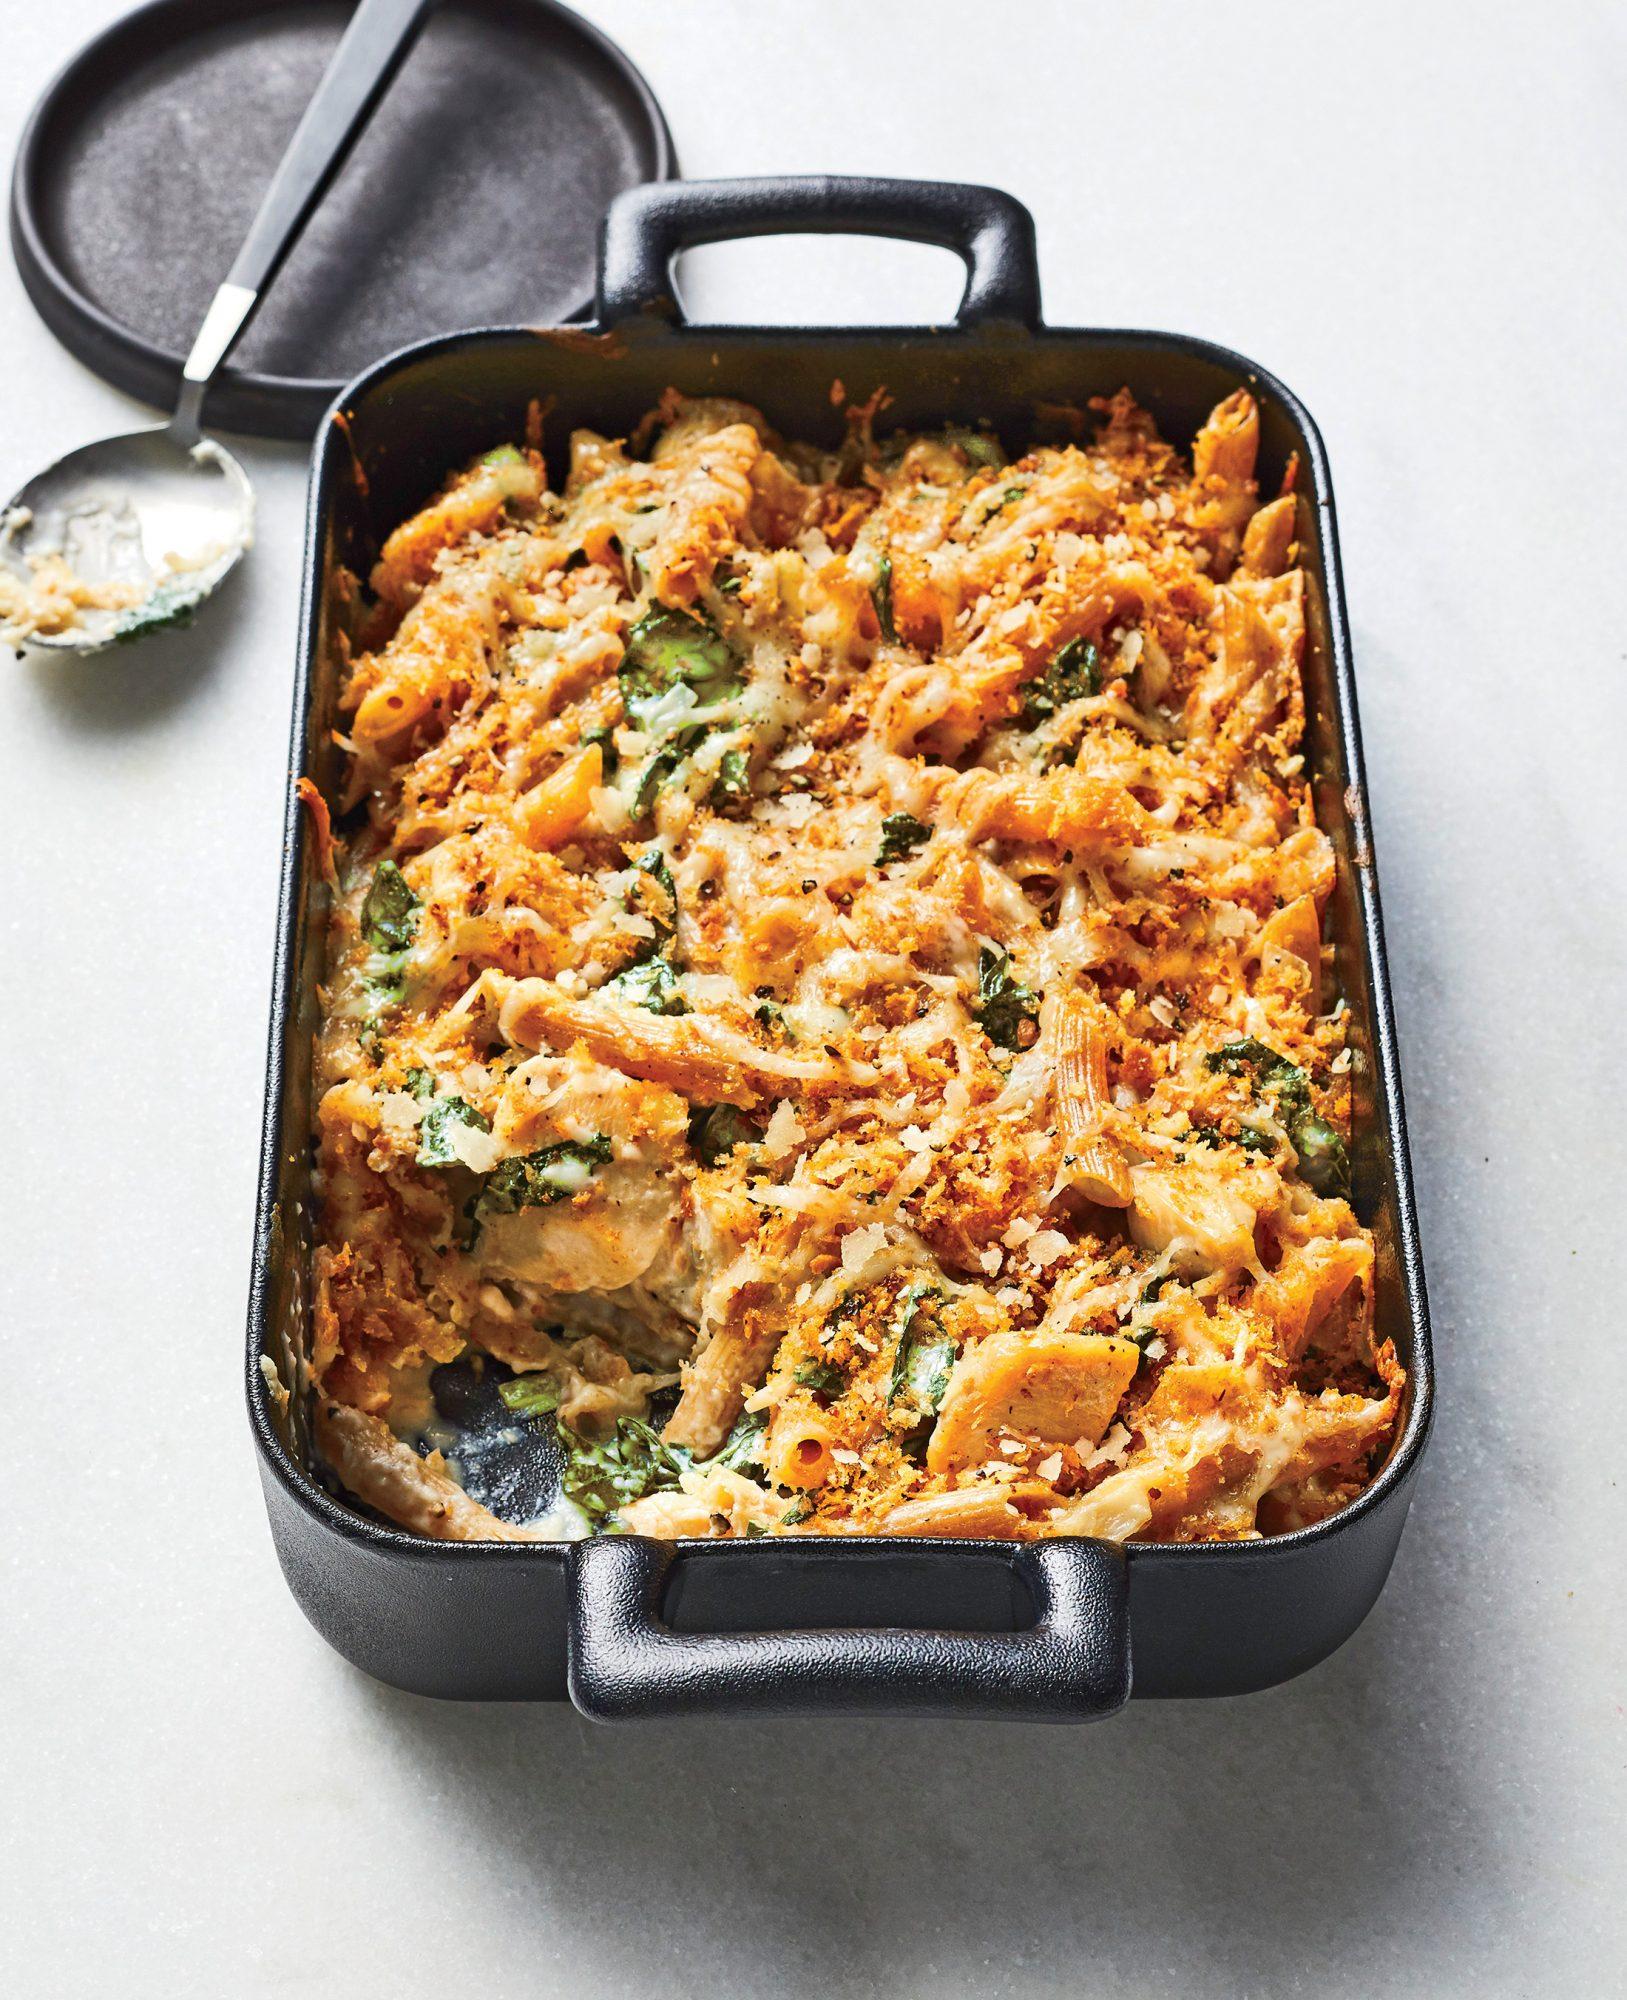 Chicken-and-Kale Alfredo Bake